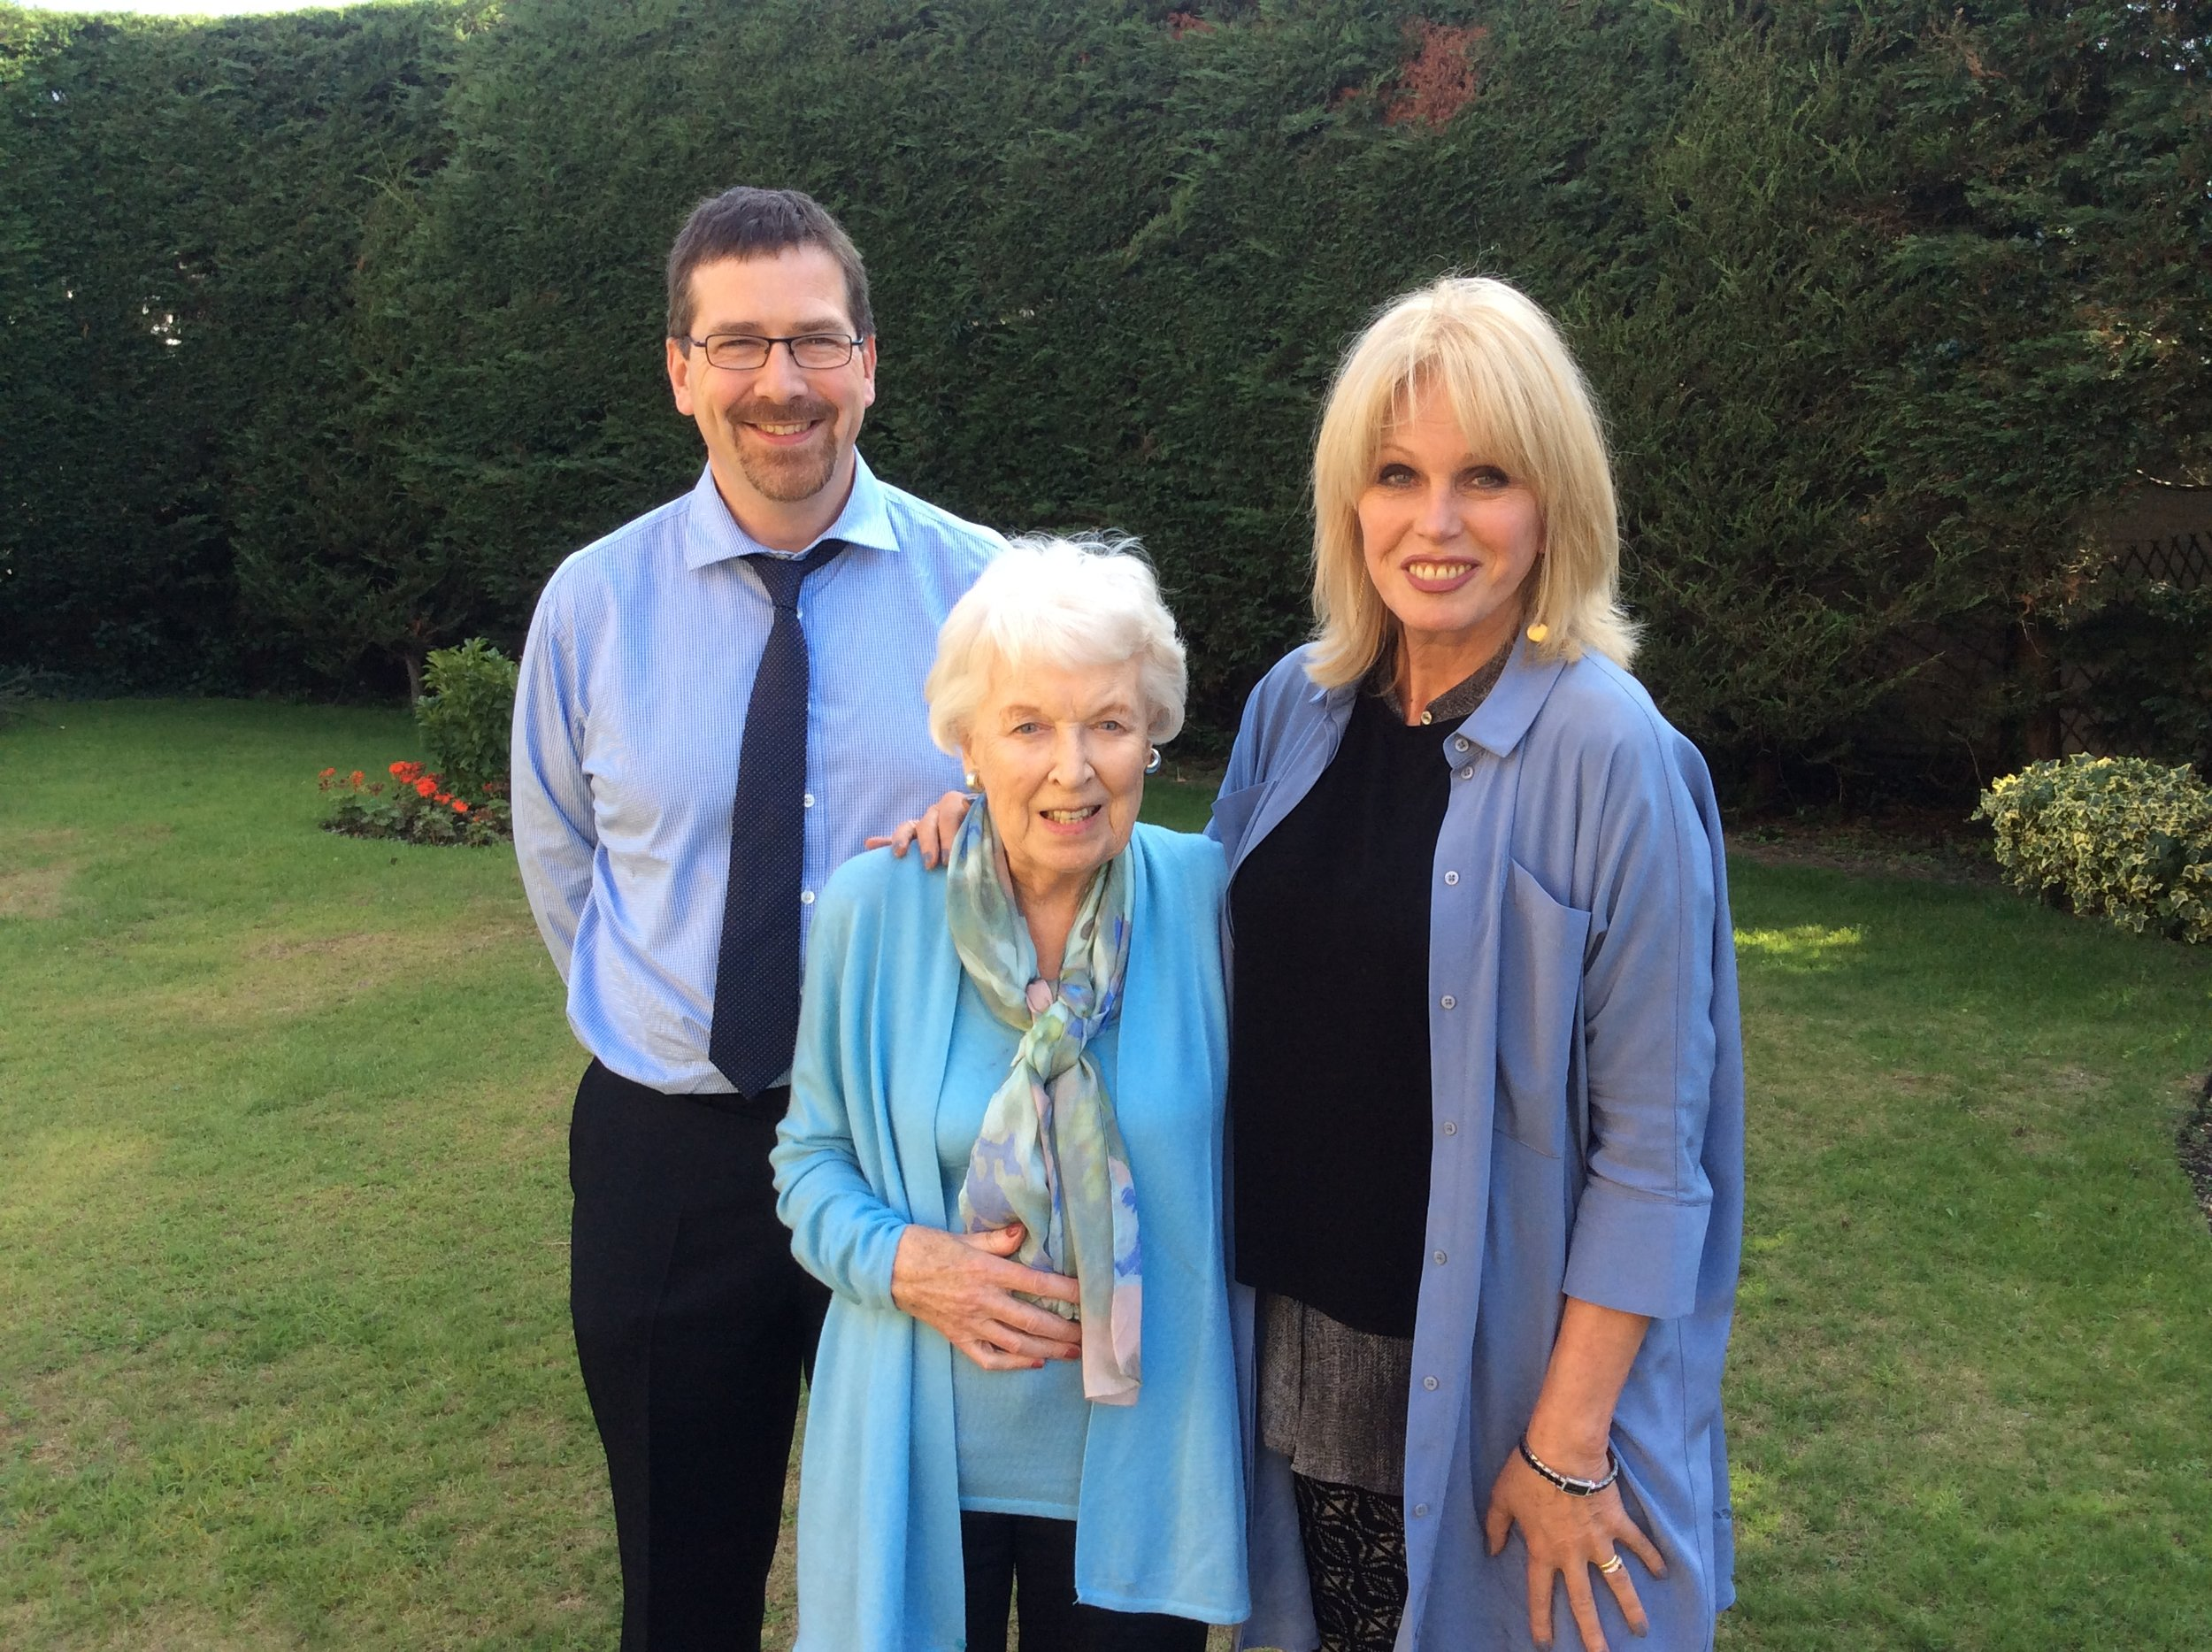 (L-R) Steve Doherty (producer), June Whitfield, Joanna Lumley